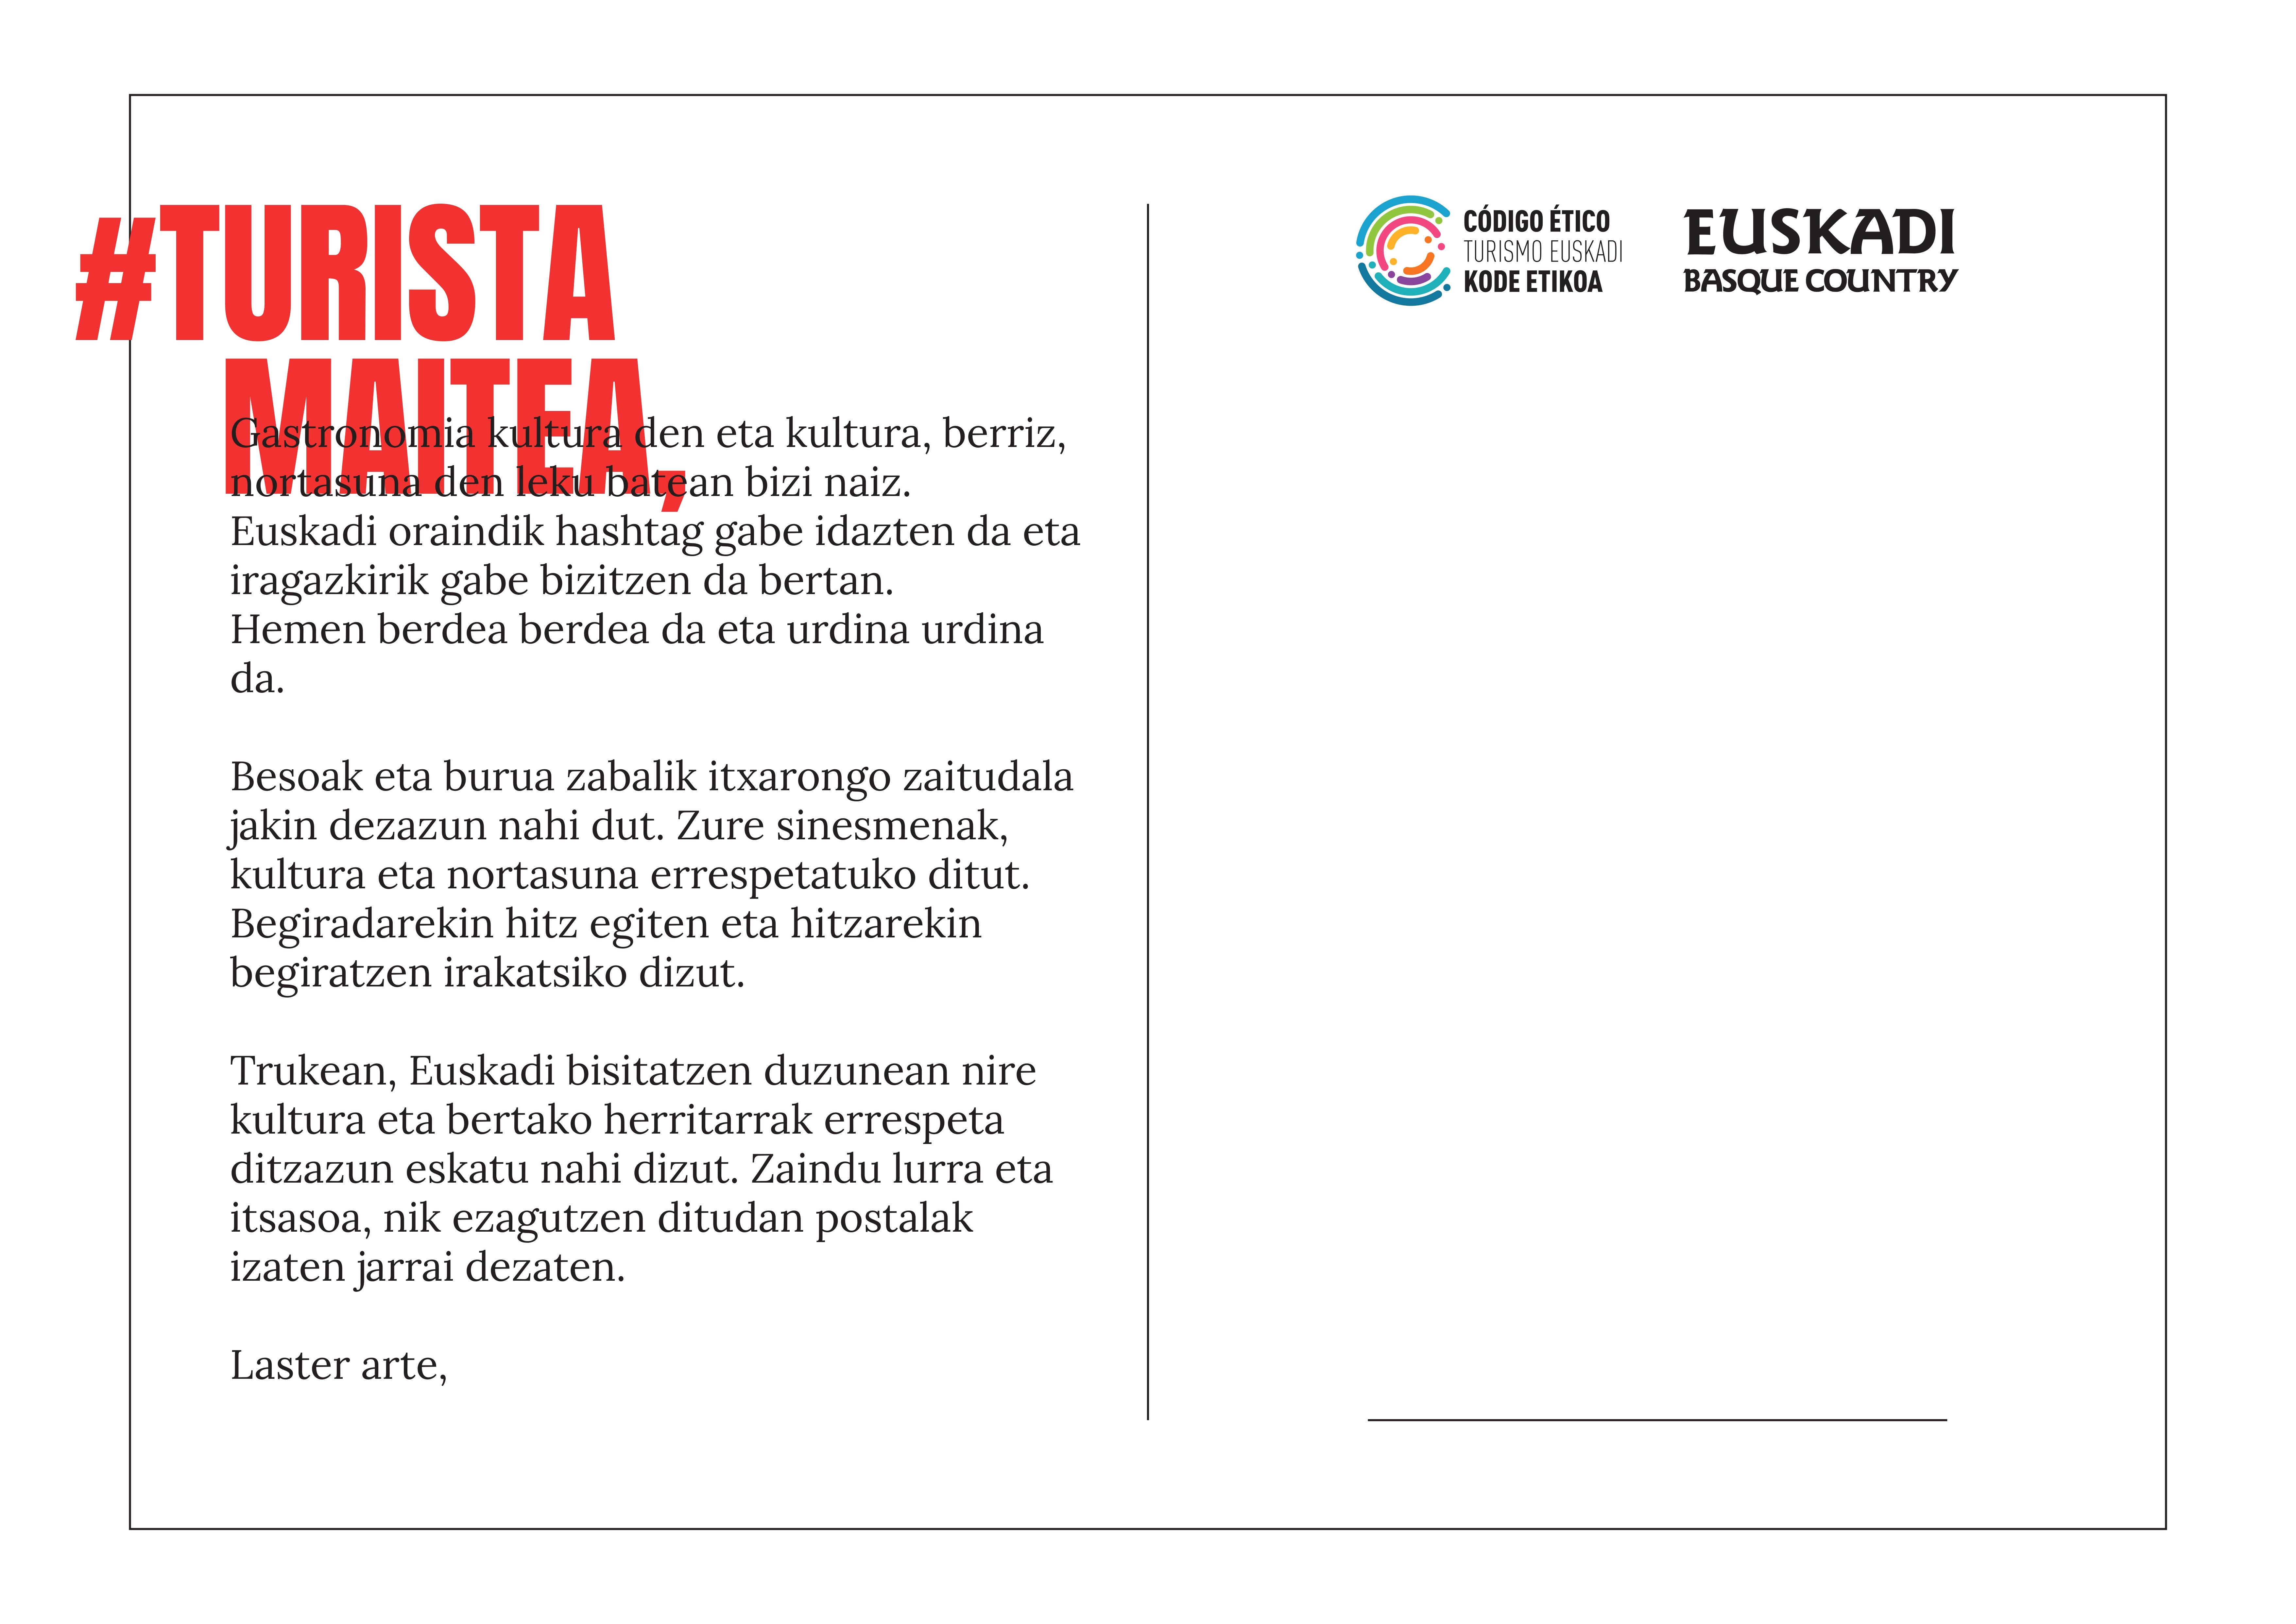 CARTA_FIRMA_page-0001.jpg